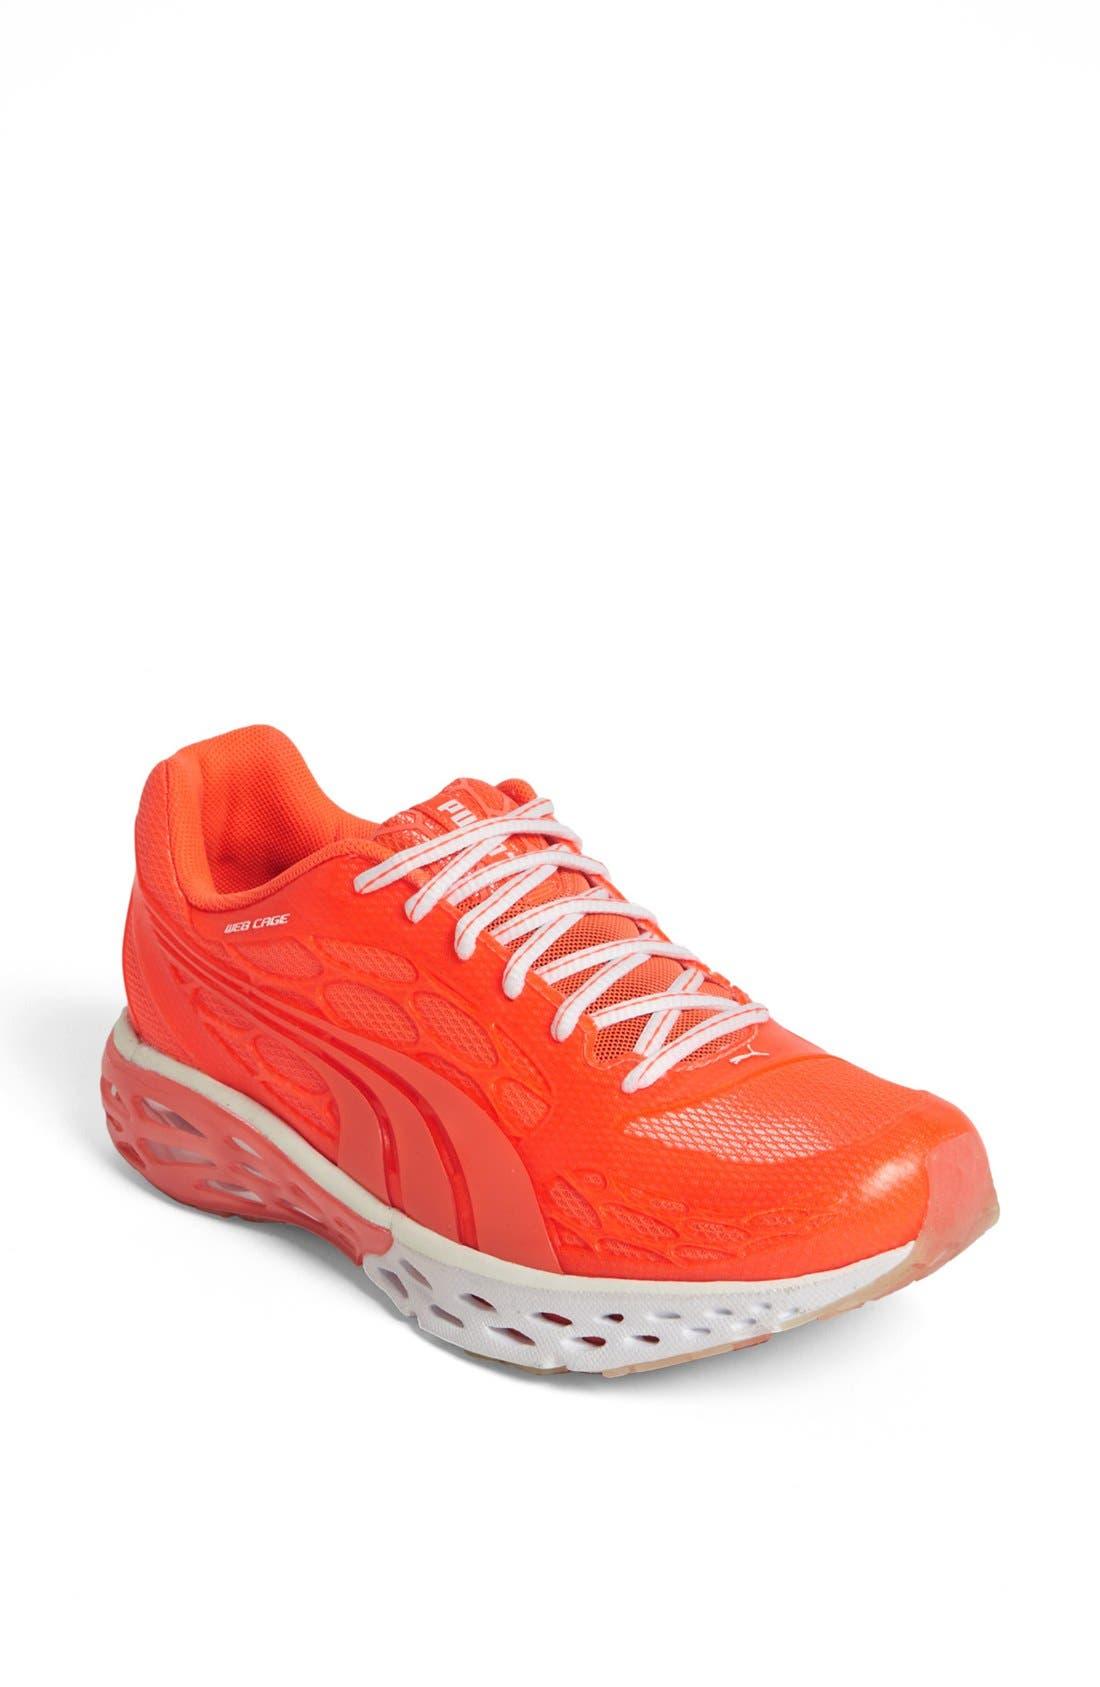 Alternate Image 1 Selected - PUMA BioWeb Elite Glow Running Shoe (Women)